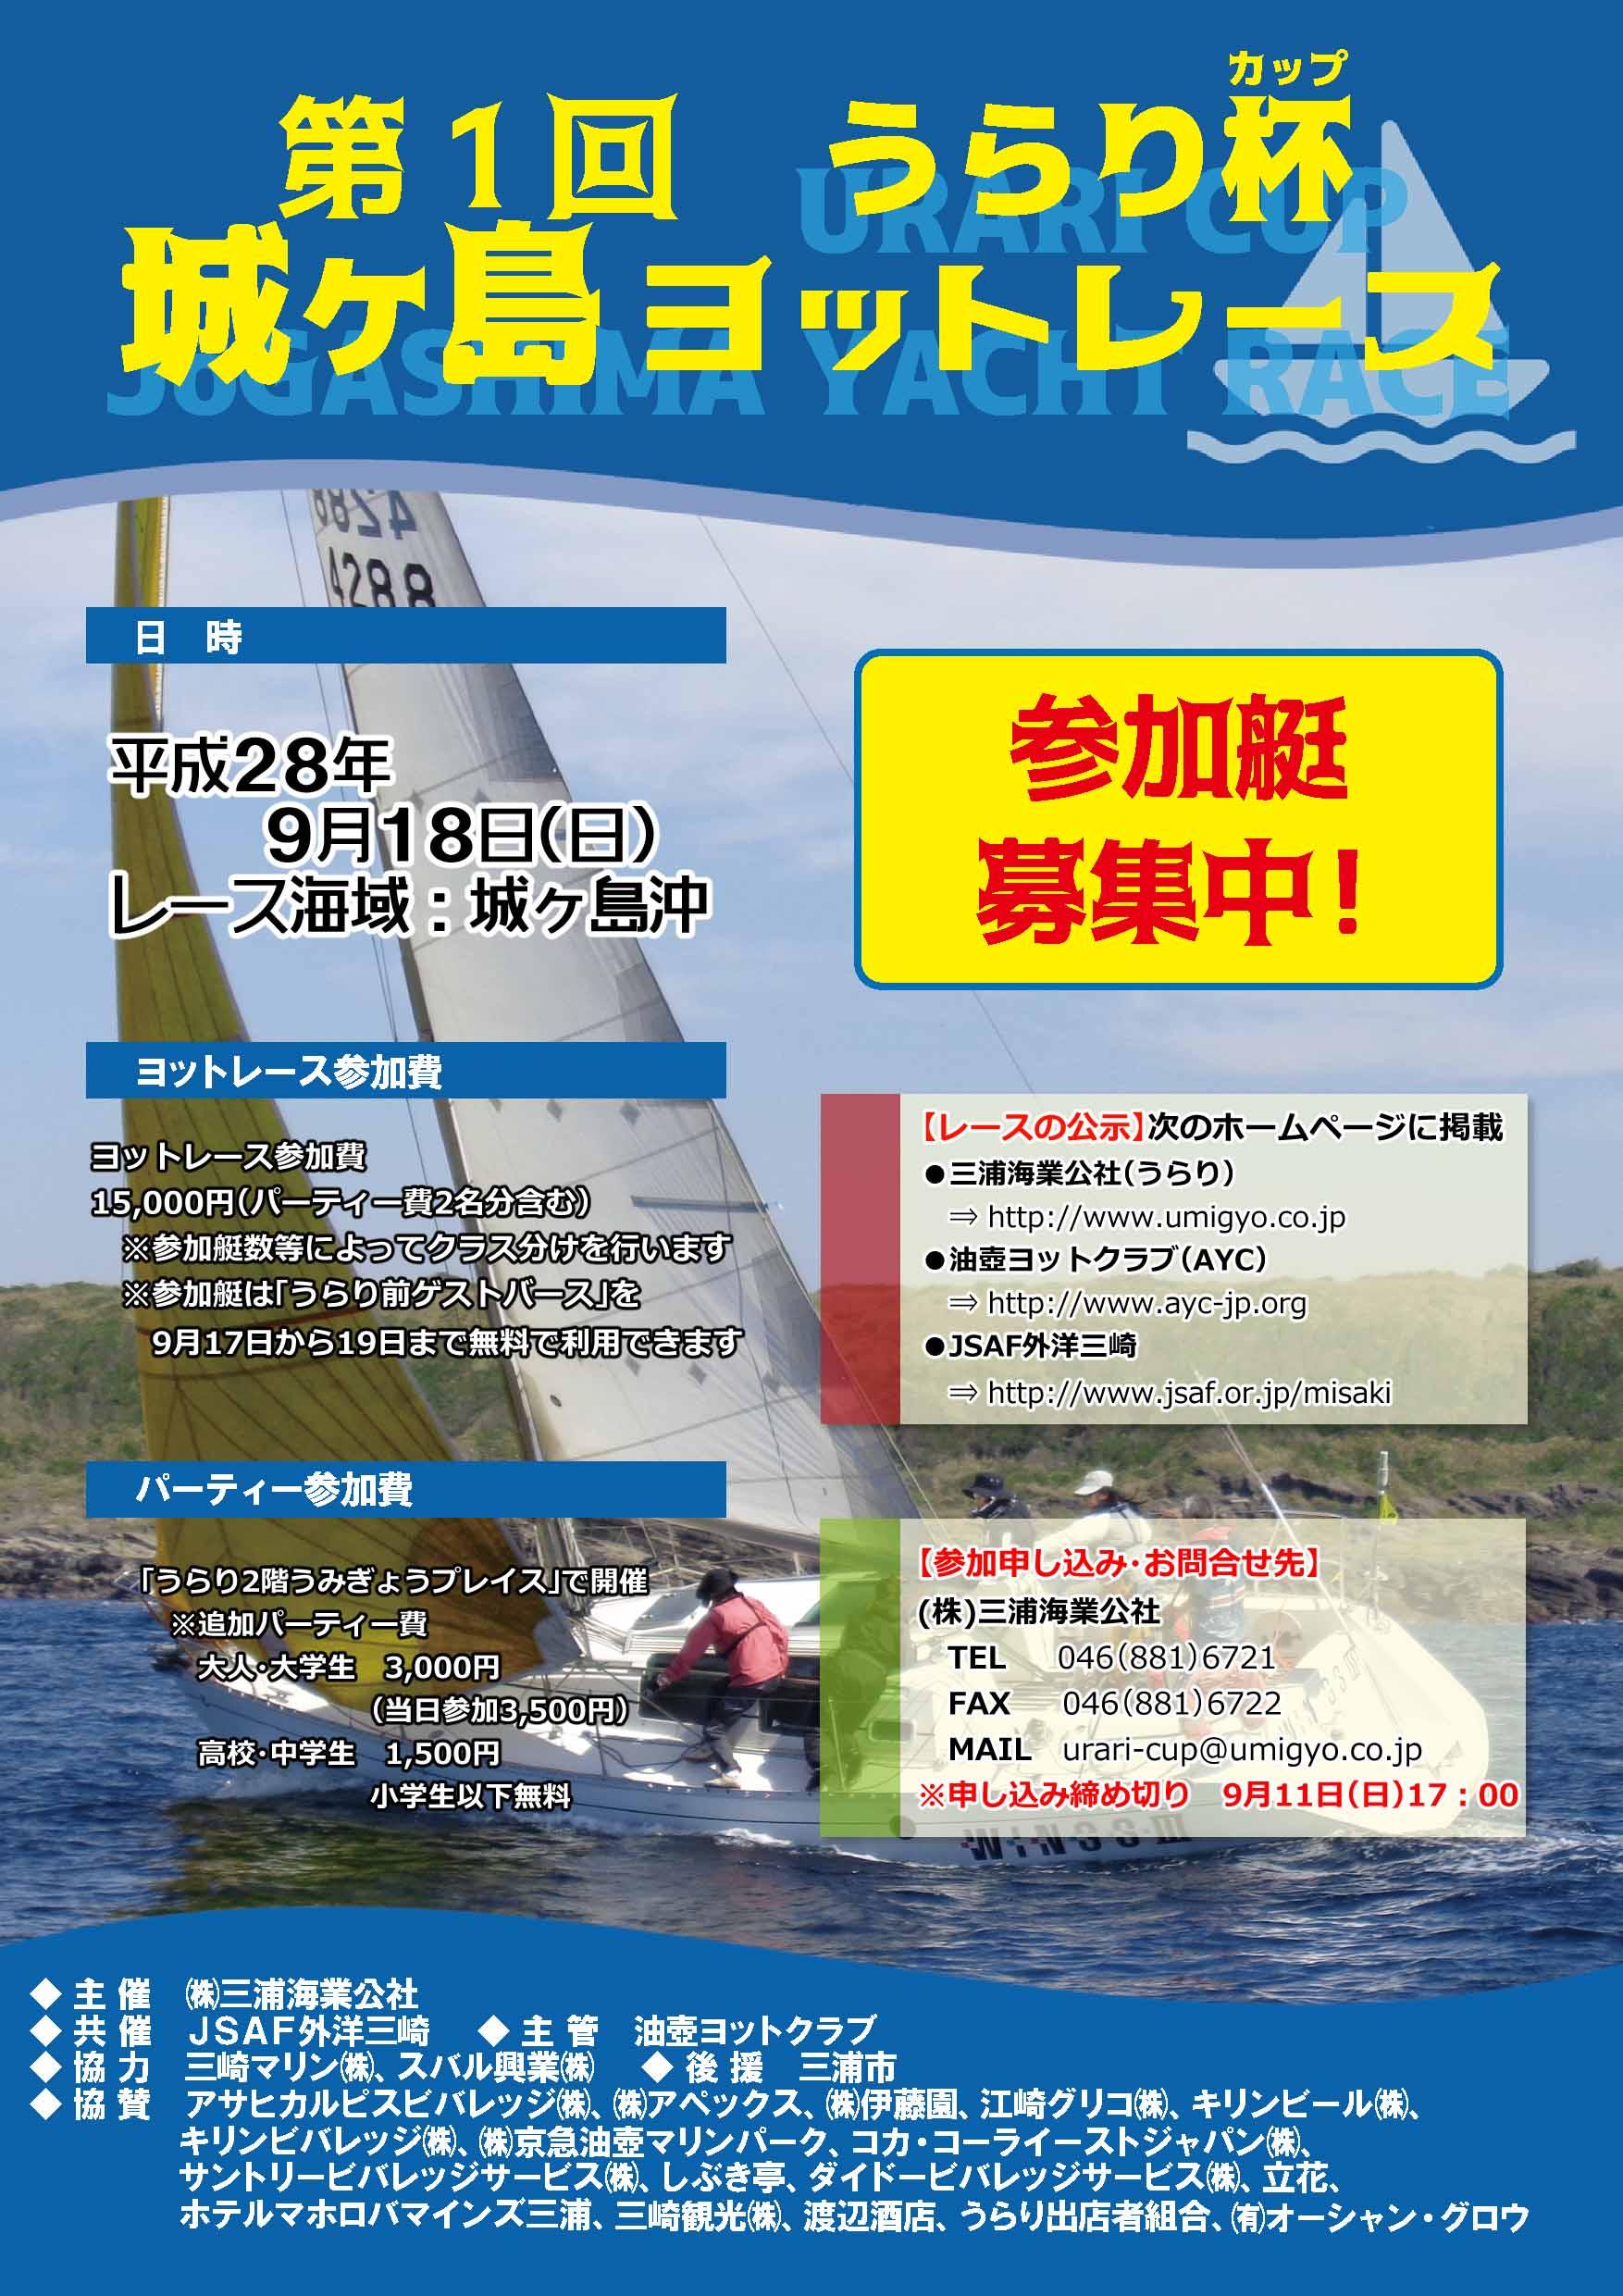 http://www.umigyo.co.jp/update/images/20160807180117-593dbcc8516124bb84772cdf6c61bad7e6abb60b.jpg